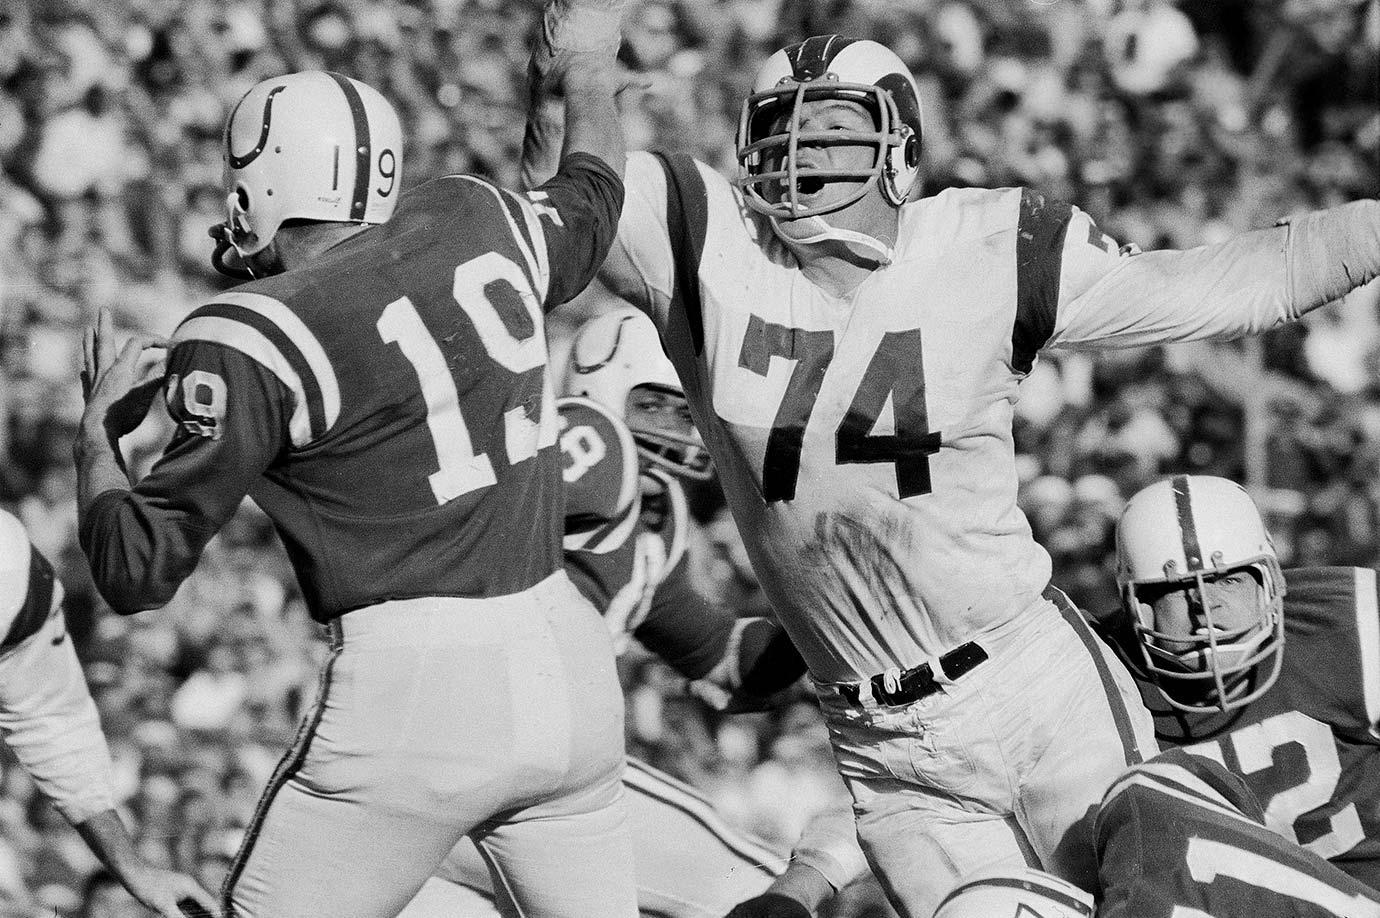 Dec. 17, 1967 — Los Angeles Rams vs. Baltimore Colts